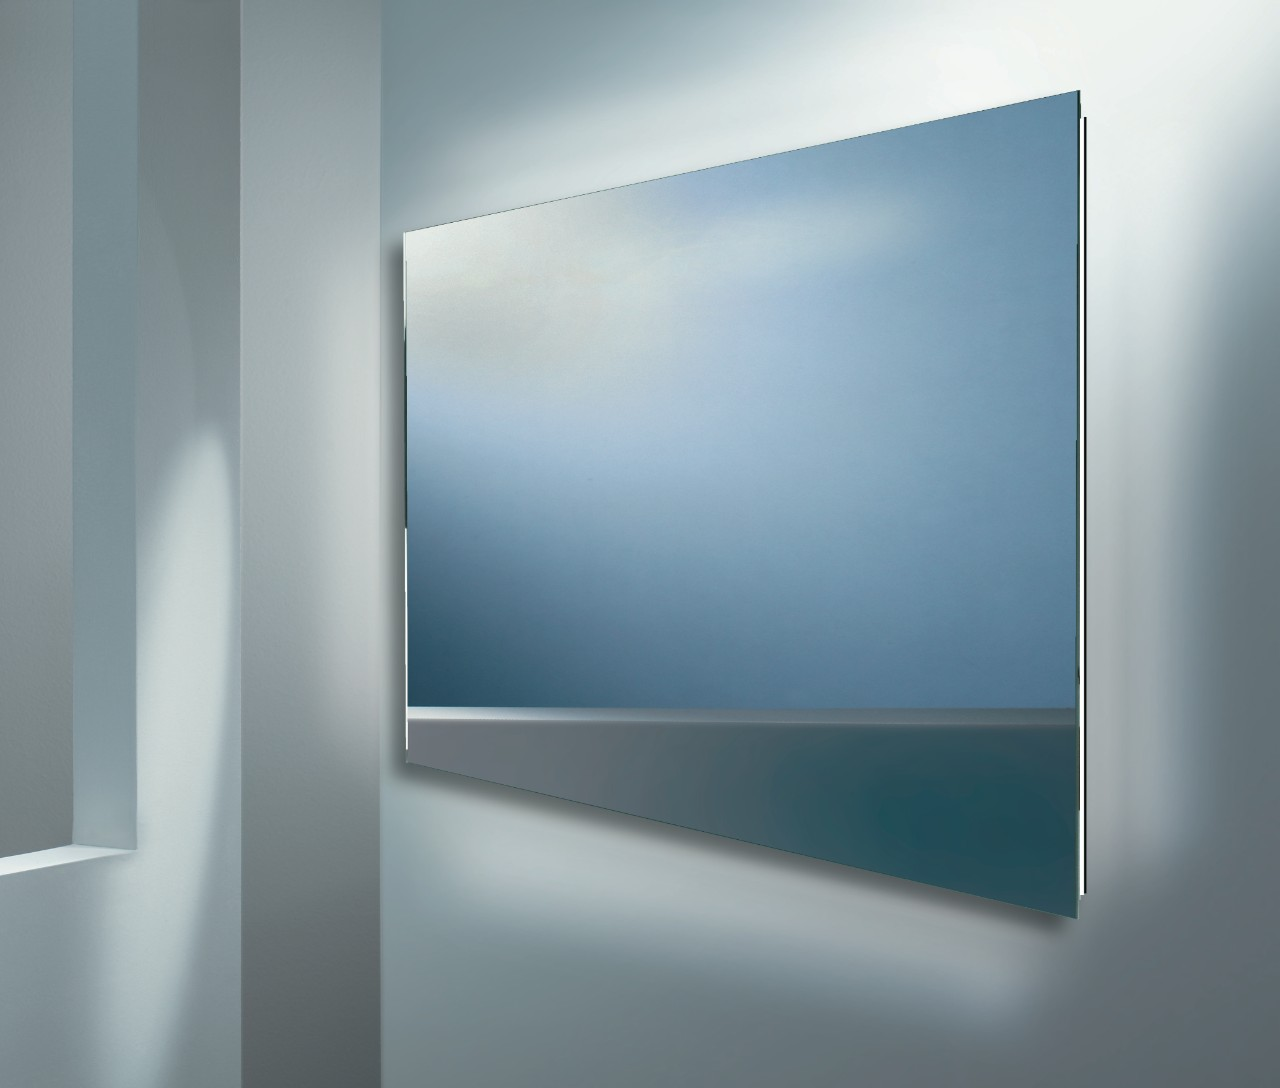 badkamerspiegel met diffuse led verlichting